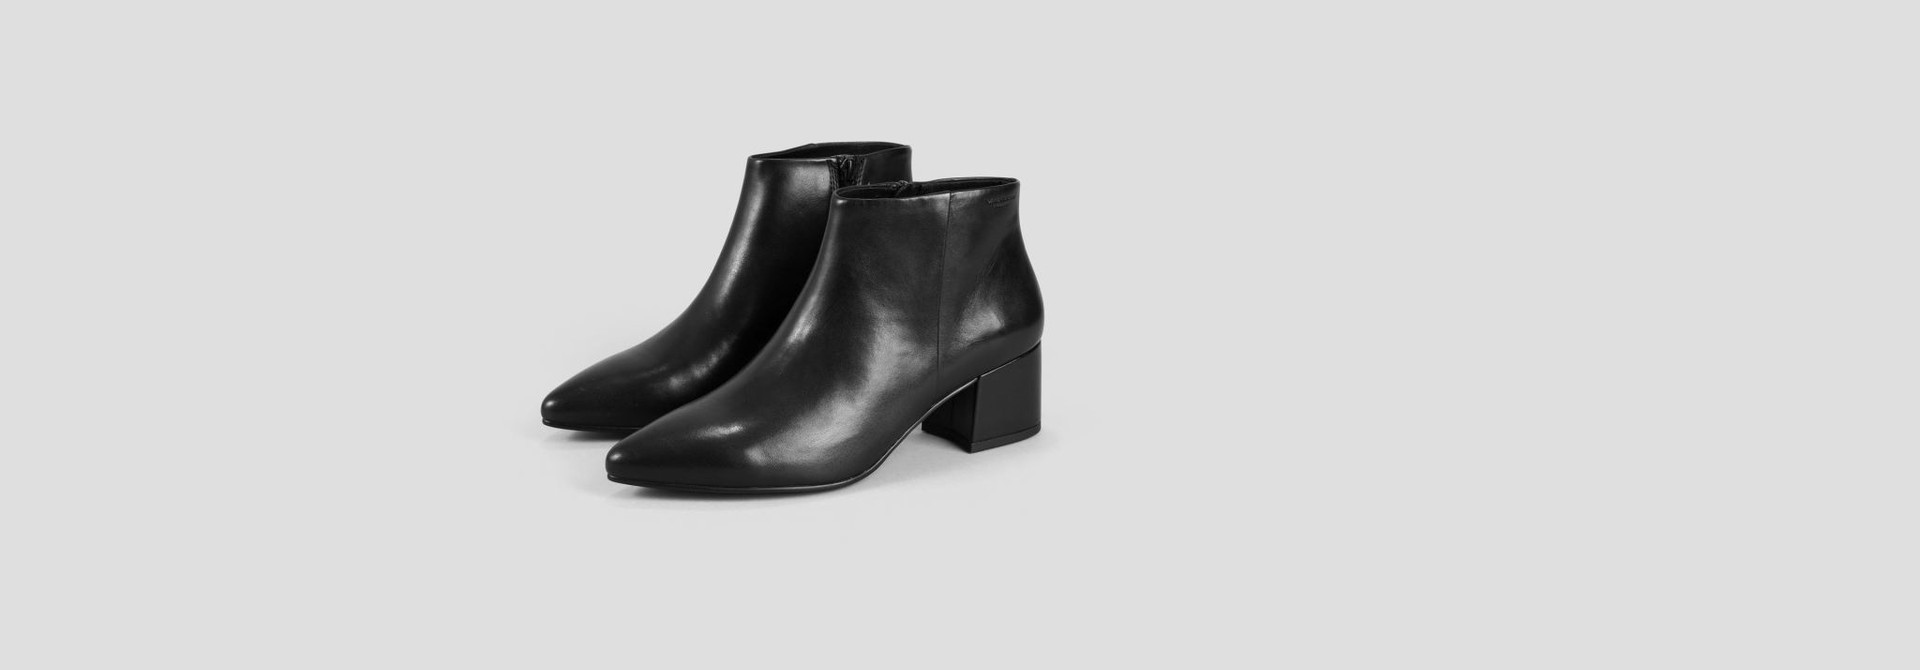 Mya Half High Black Leather Boots